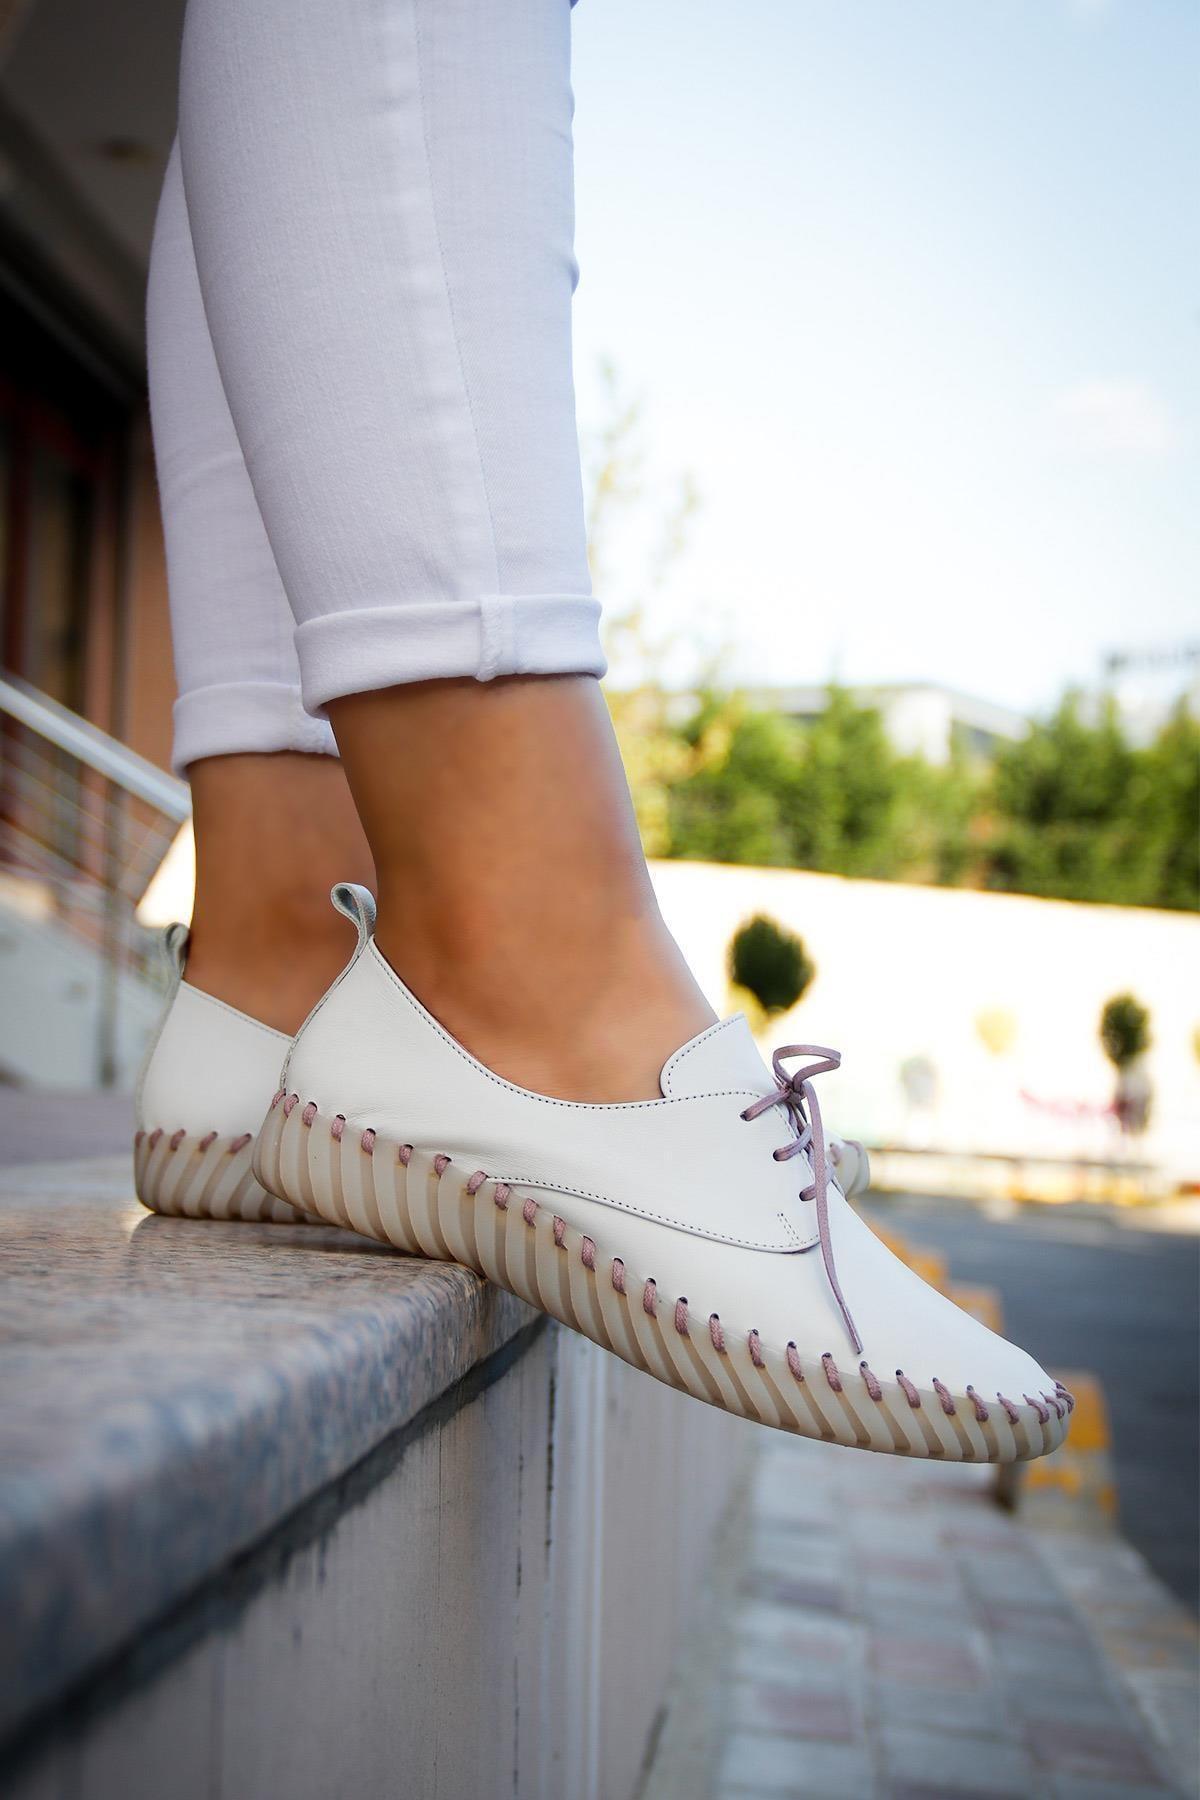 BUENO Shoes Kadın Spor 20wq0200 1